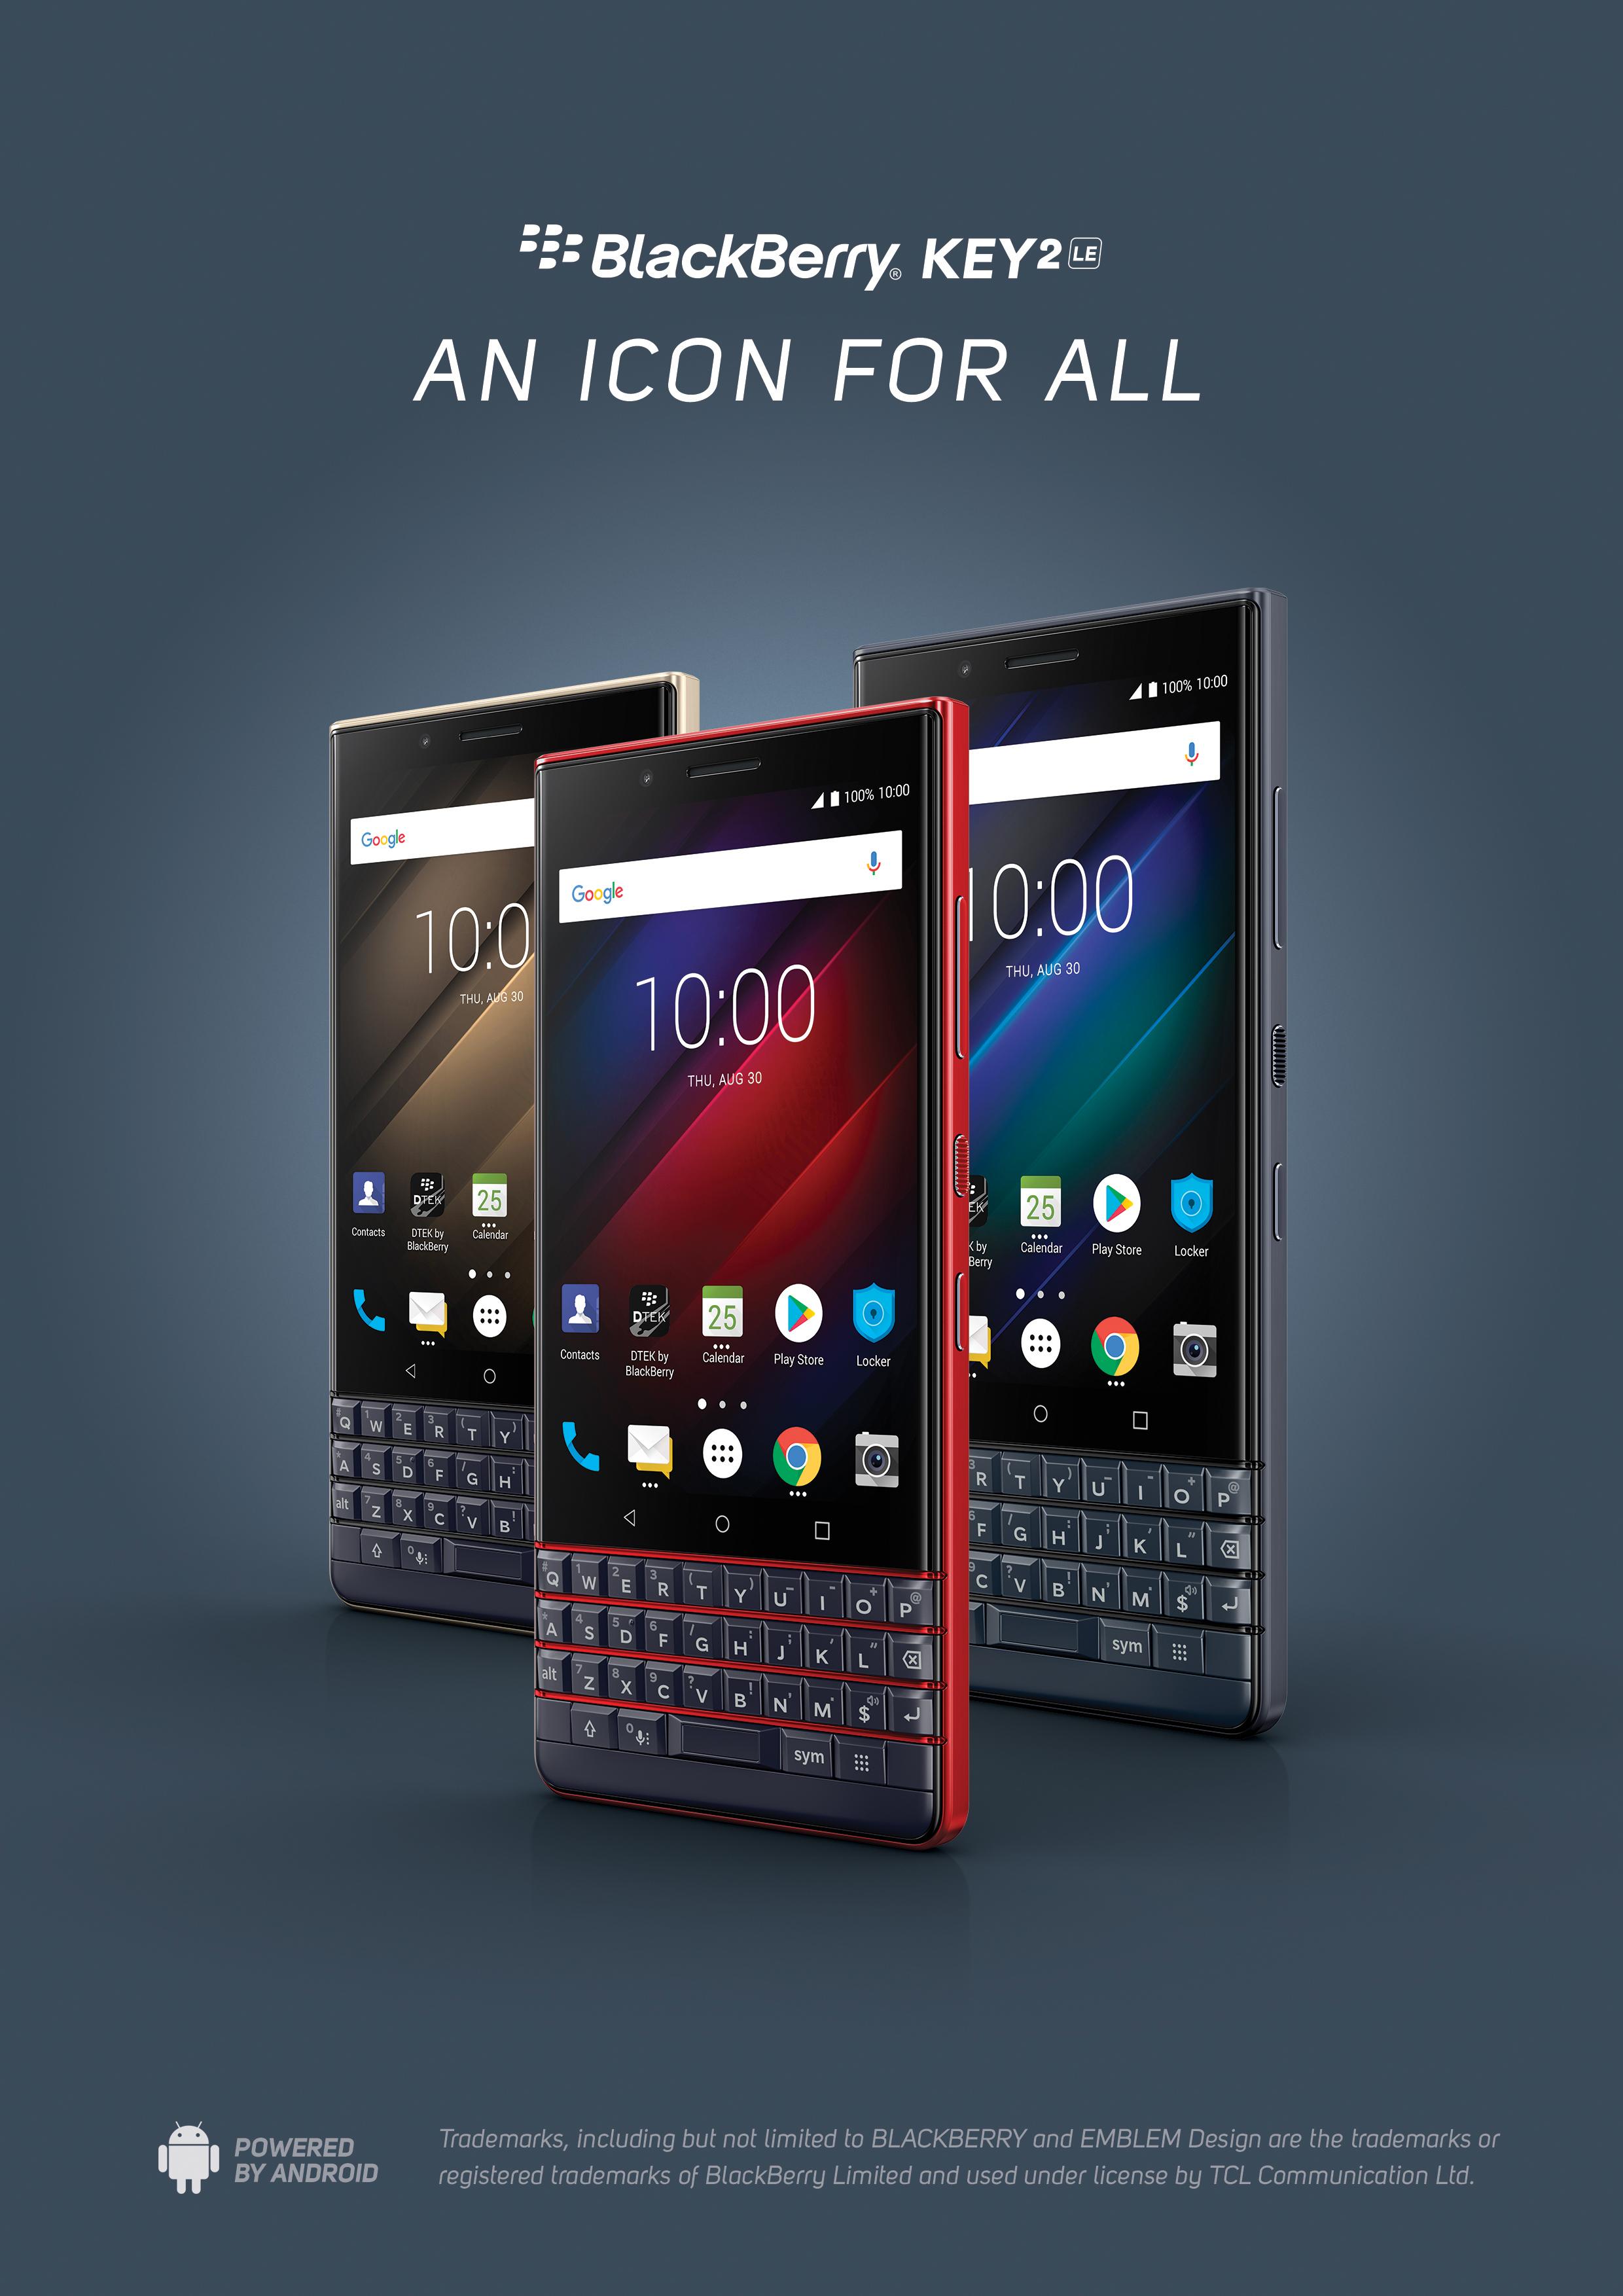 BlackBerry KEY2 LE Hero Image